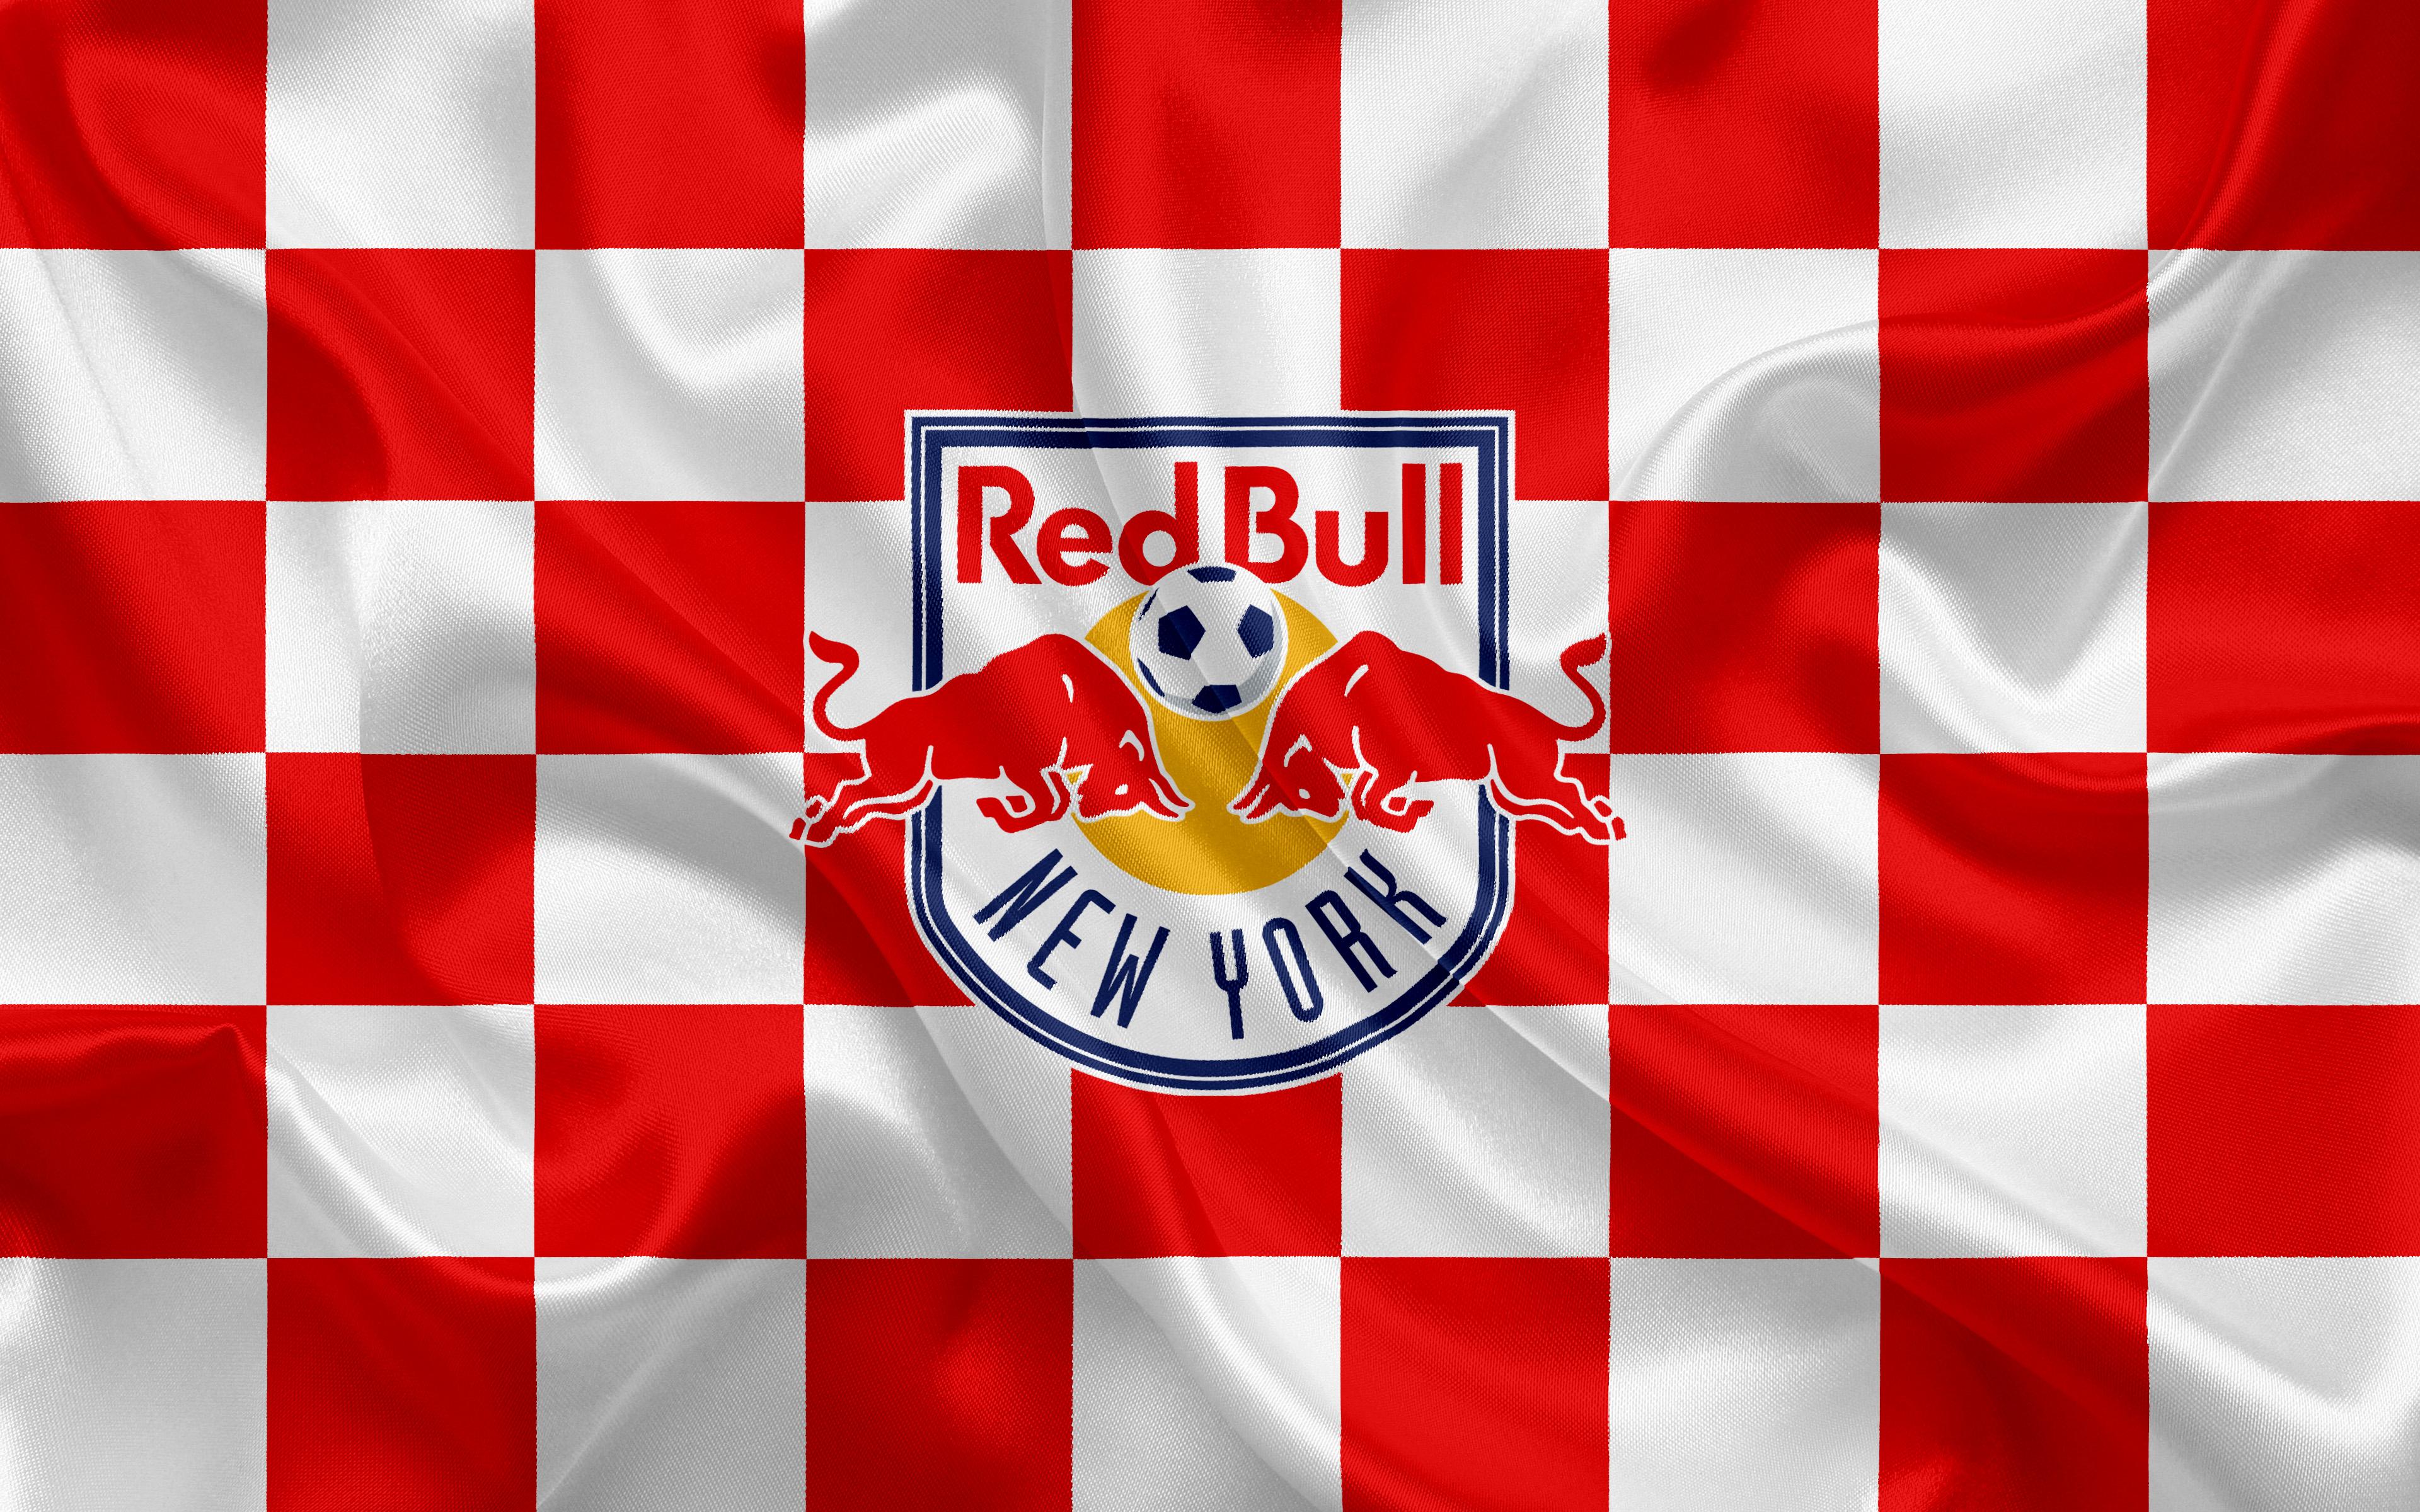 New York Red Bulls 4k Ultra Hd Wallpaper Background Image